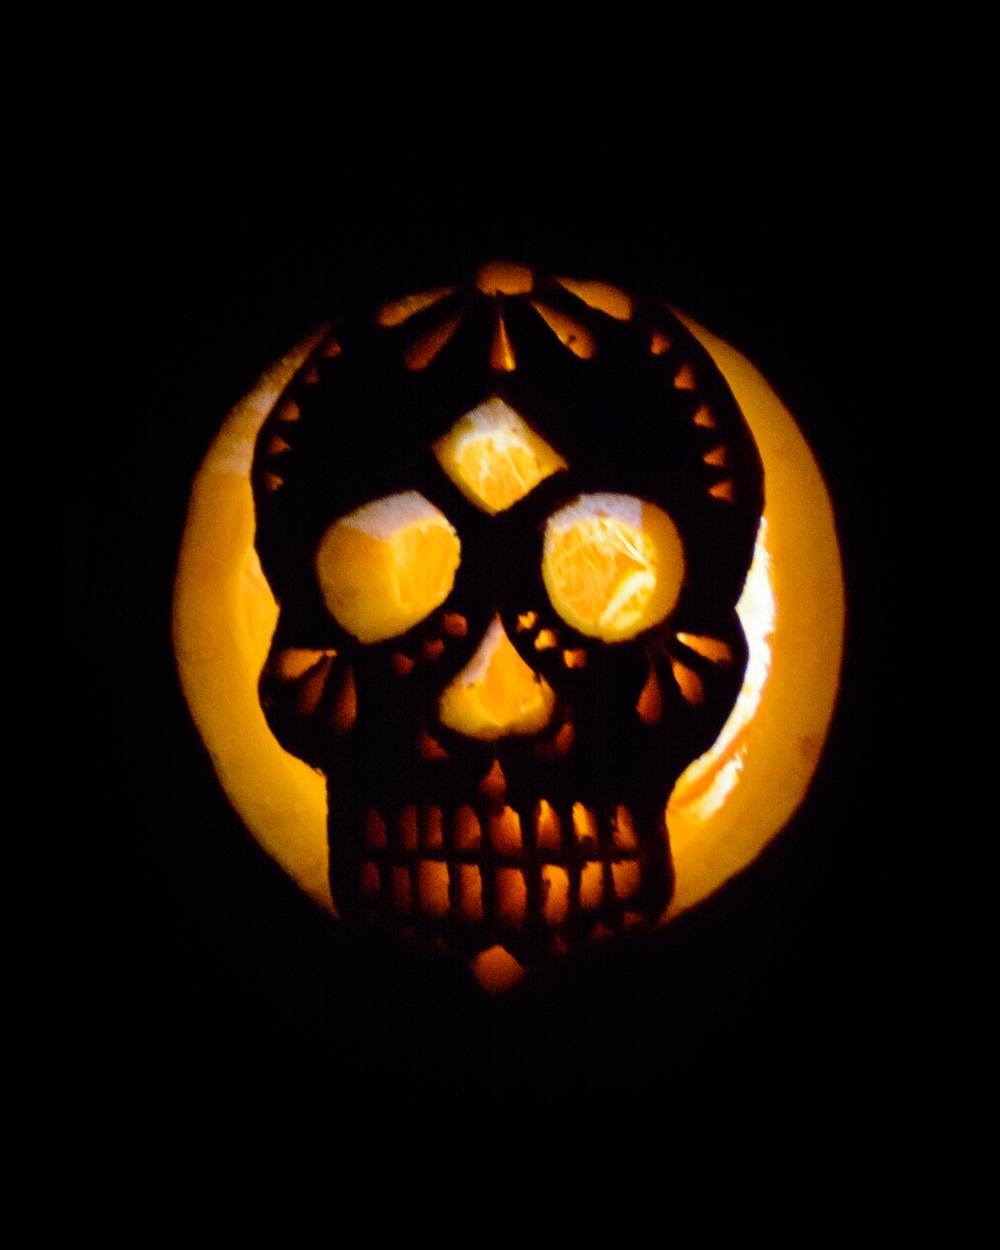 Halloween-10.31.2015-21.jpg